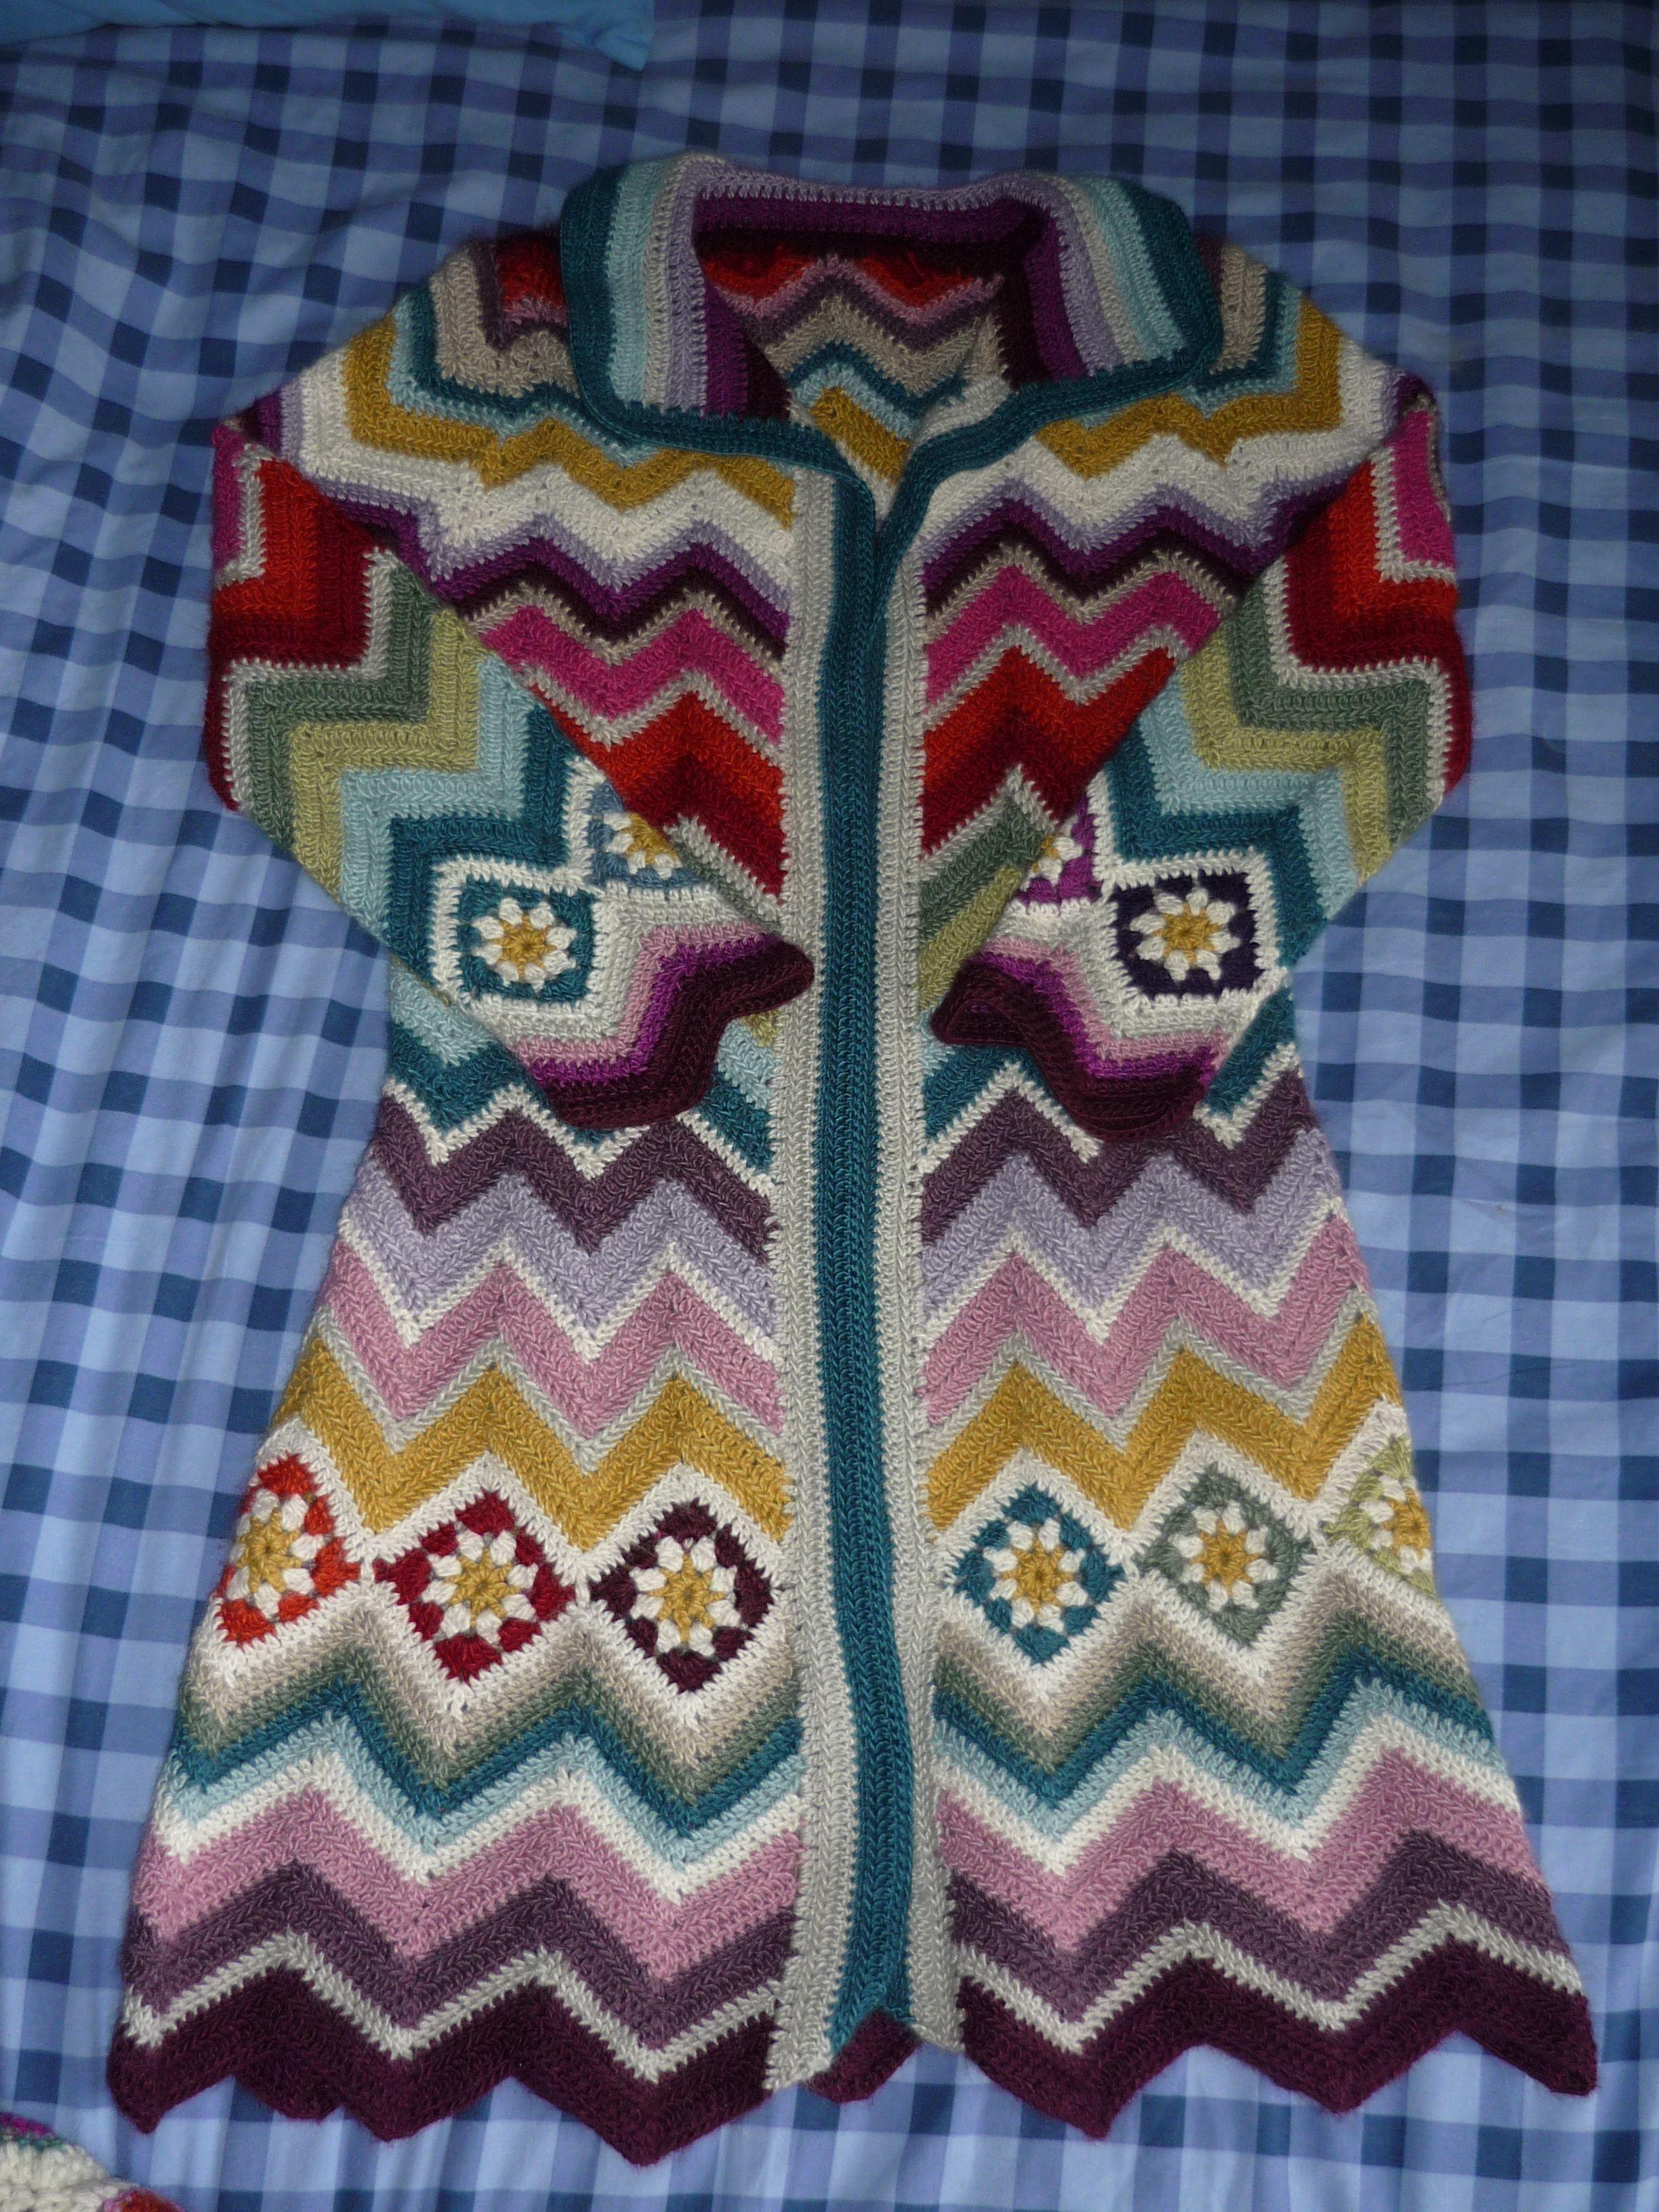 Missoni Coat My Favorite Type Of Long Crocheted Coats Granny Trippy Hippy Crochet Afghan Pattern Kingdom